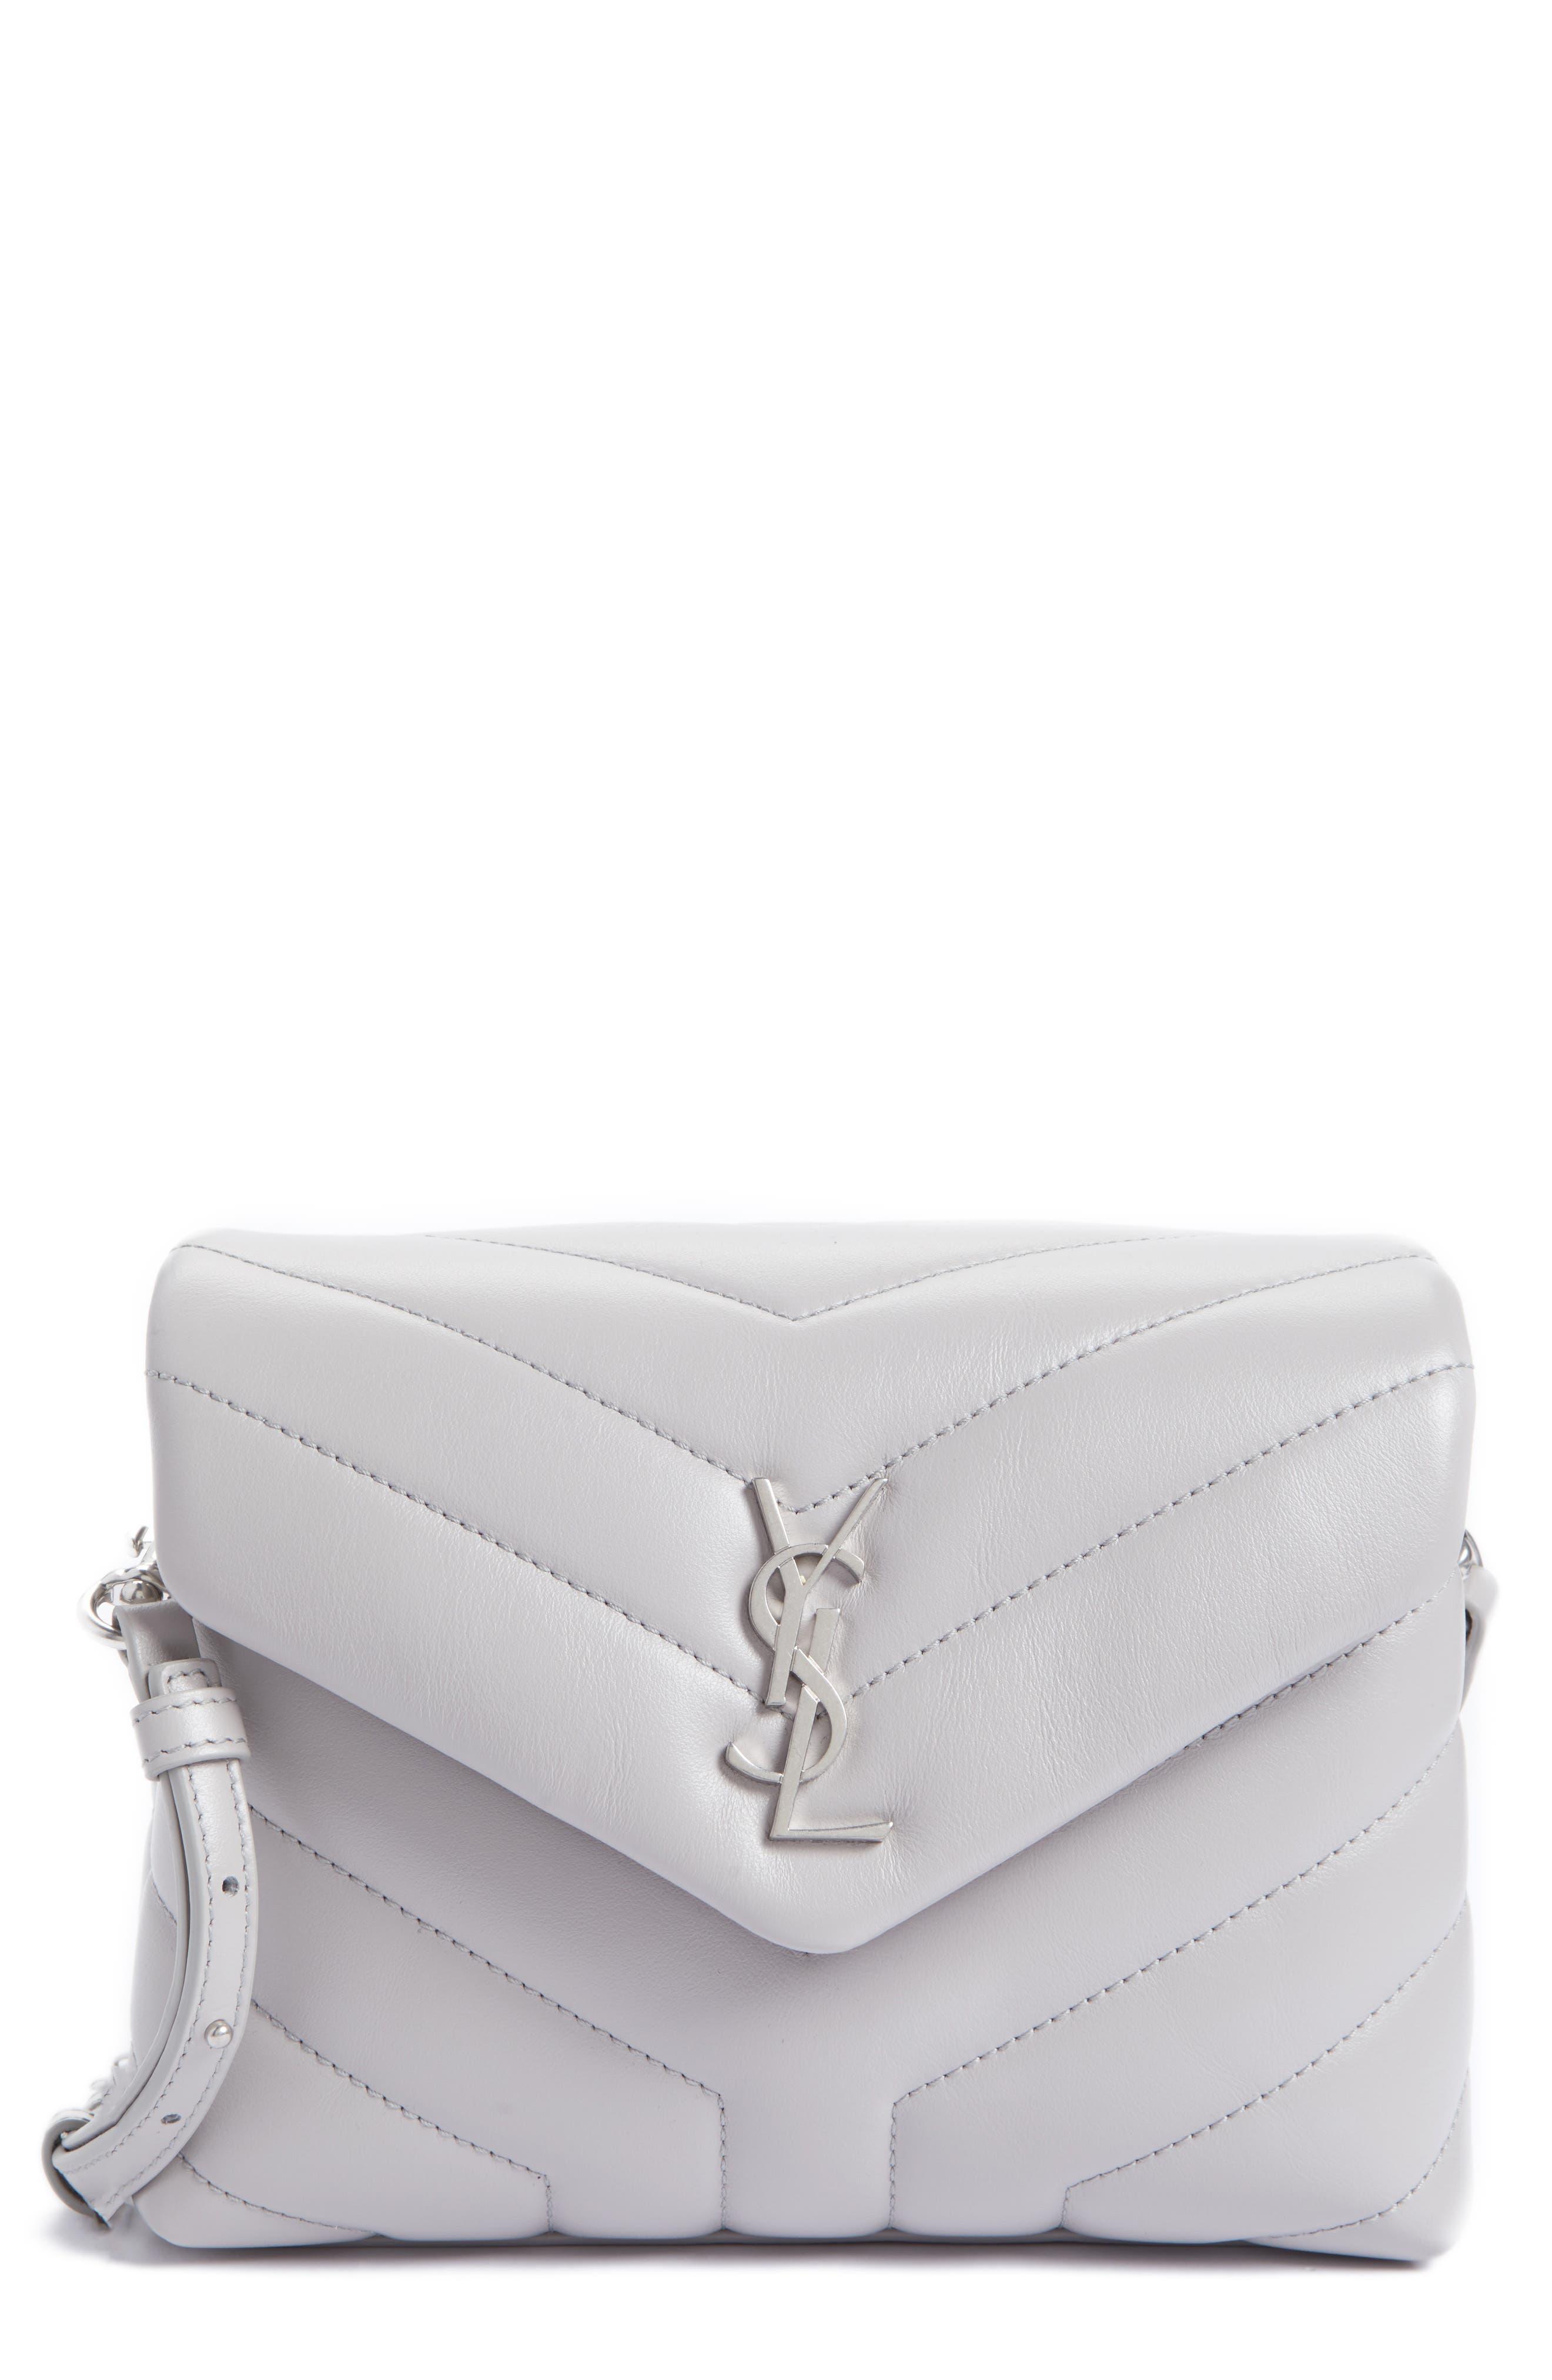 Saint Laurent Toy LouLou Calfskin Leather Crossbody Bag